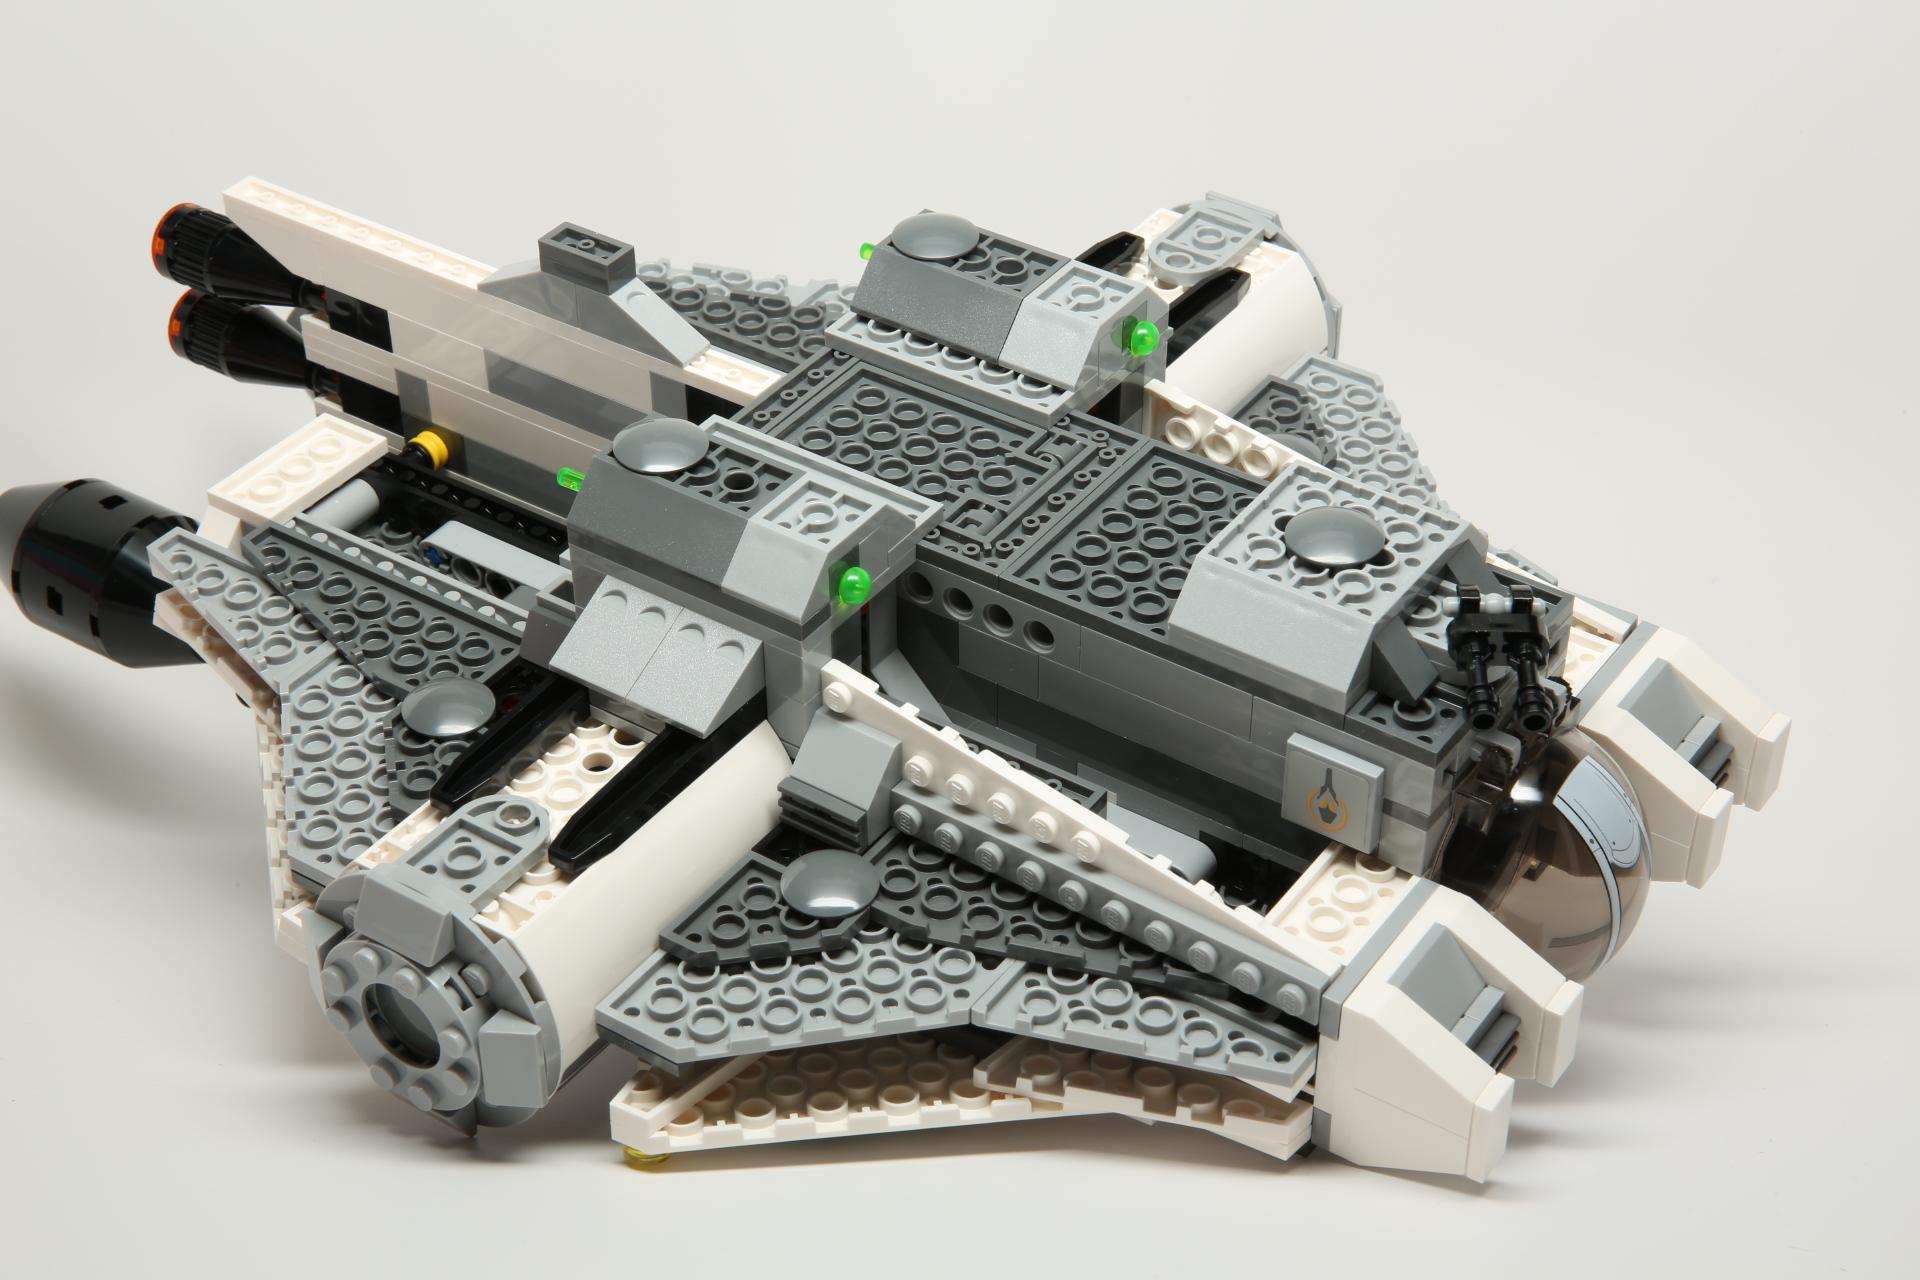 lego escape pod instructions